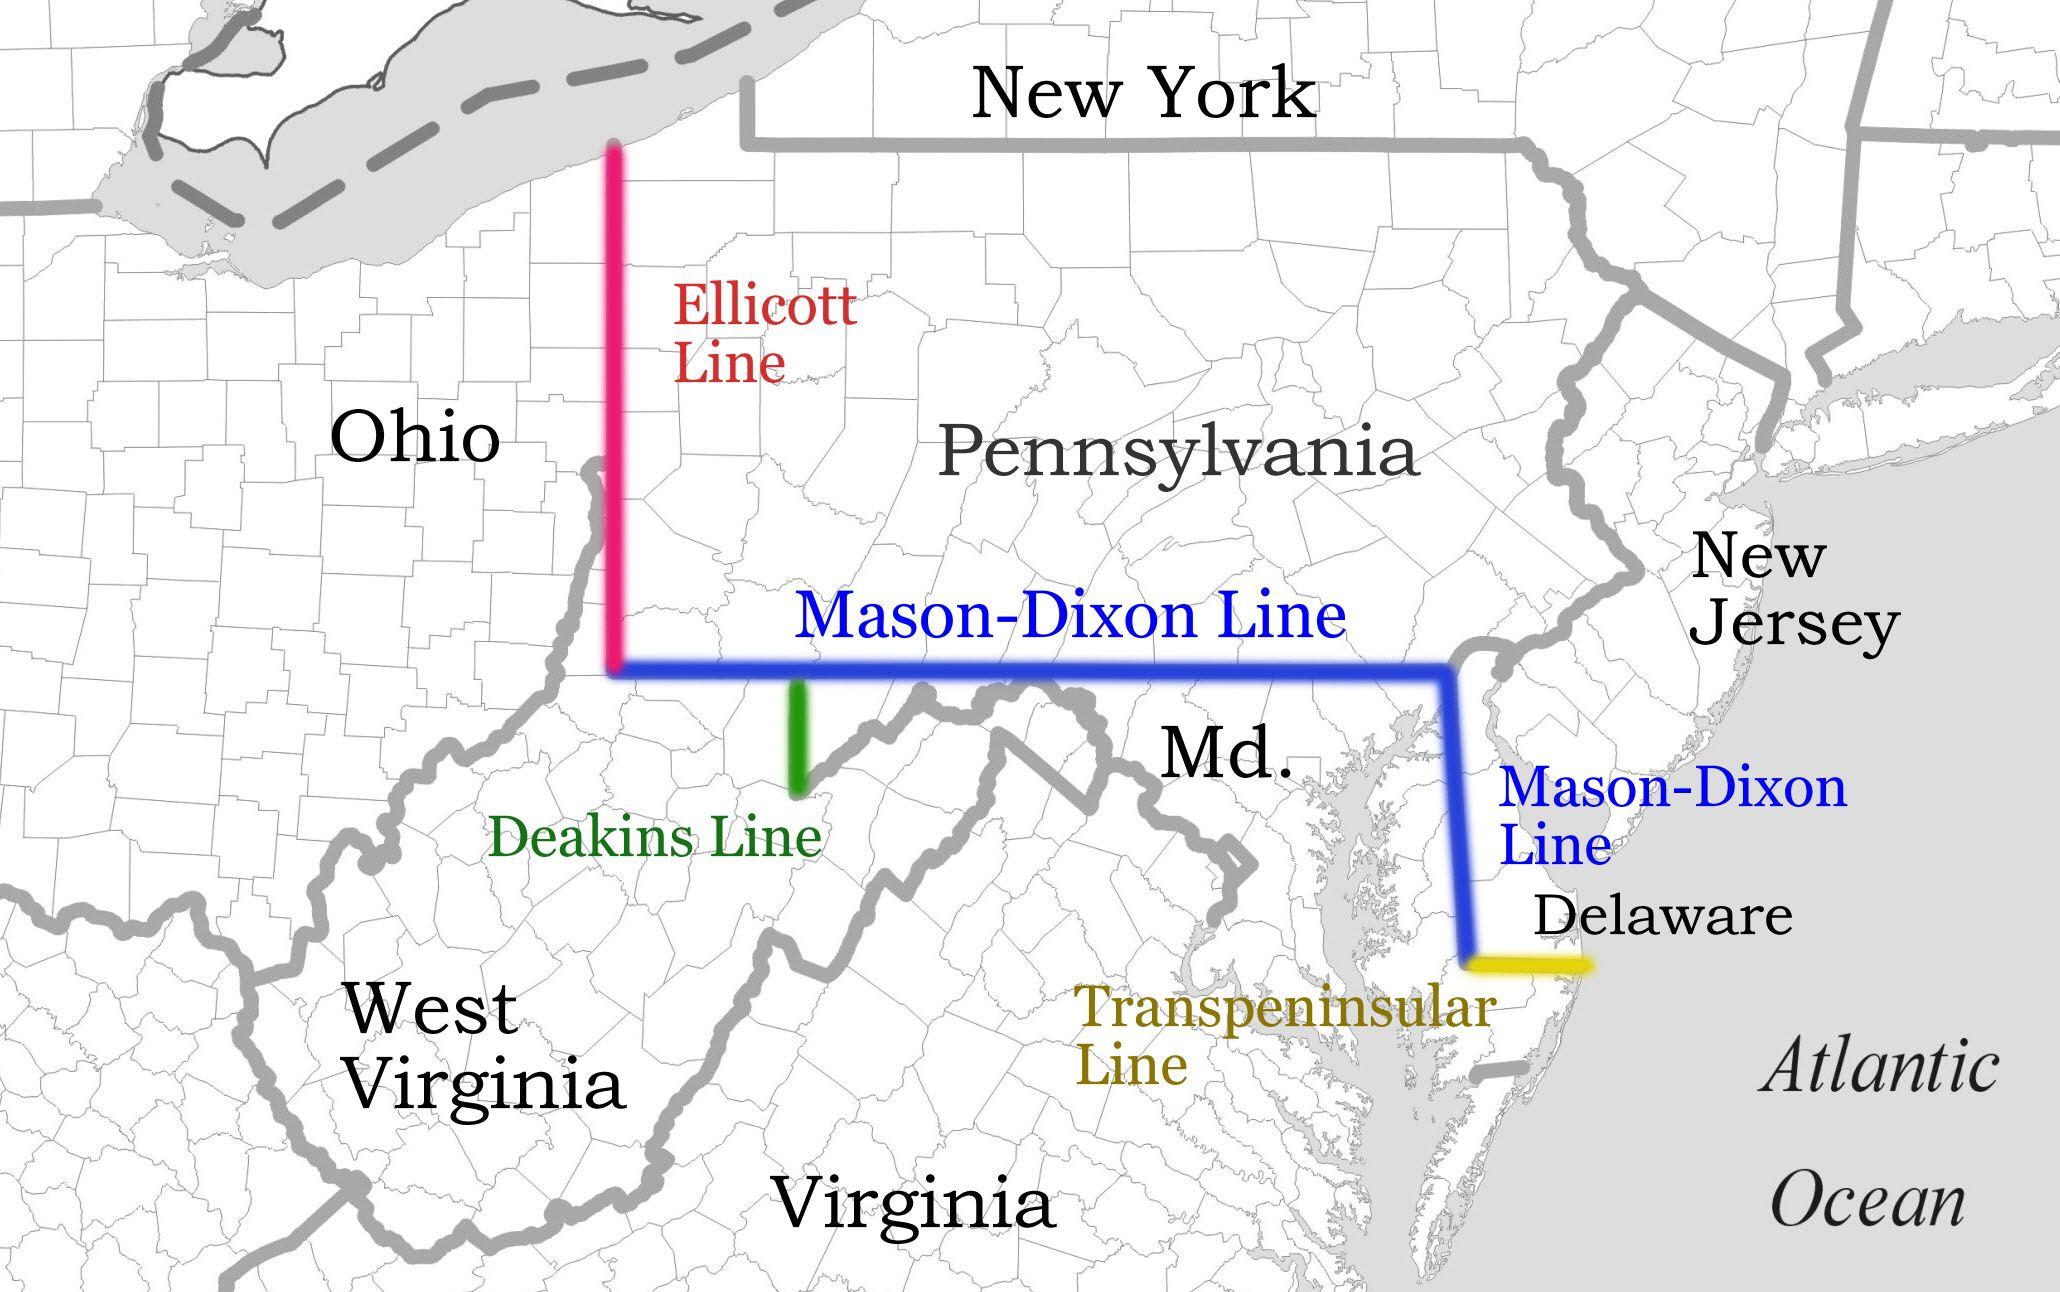 Mason Dixon Line East Coast Maps And Aerials United States - Us-map-mason-dixon-line